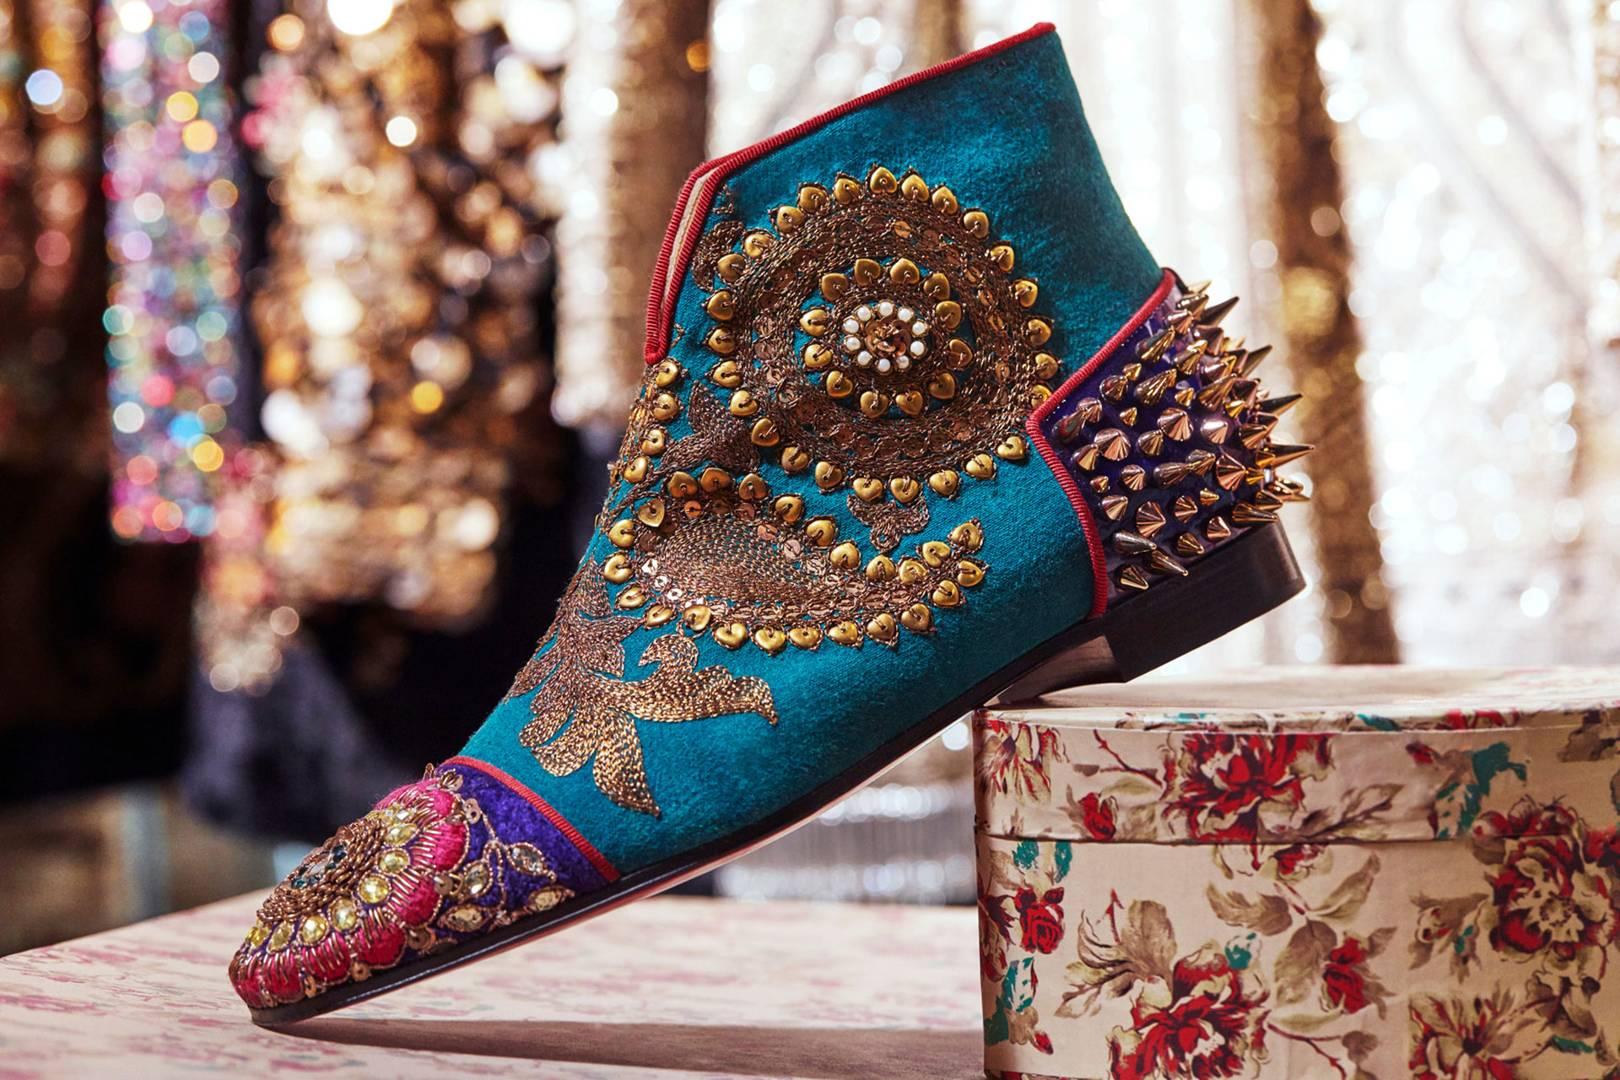 98654cb6aac2 Christian Louboutin Shoe Footwear Collaboration Sabyasachi Mukherjee ...